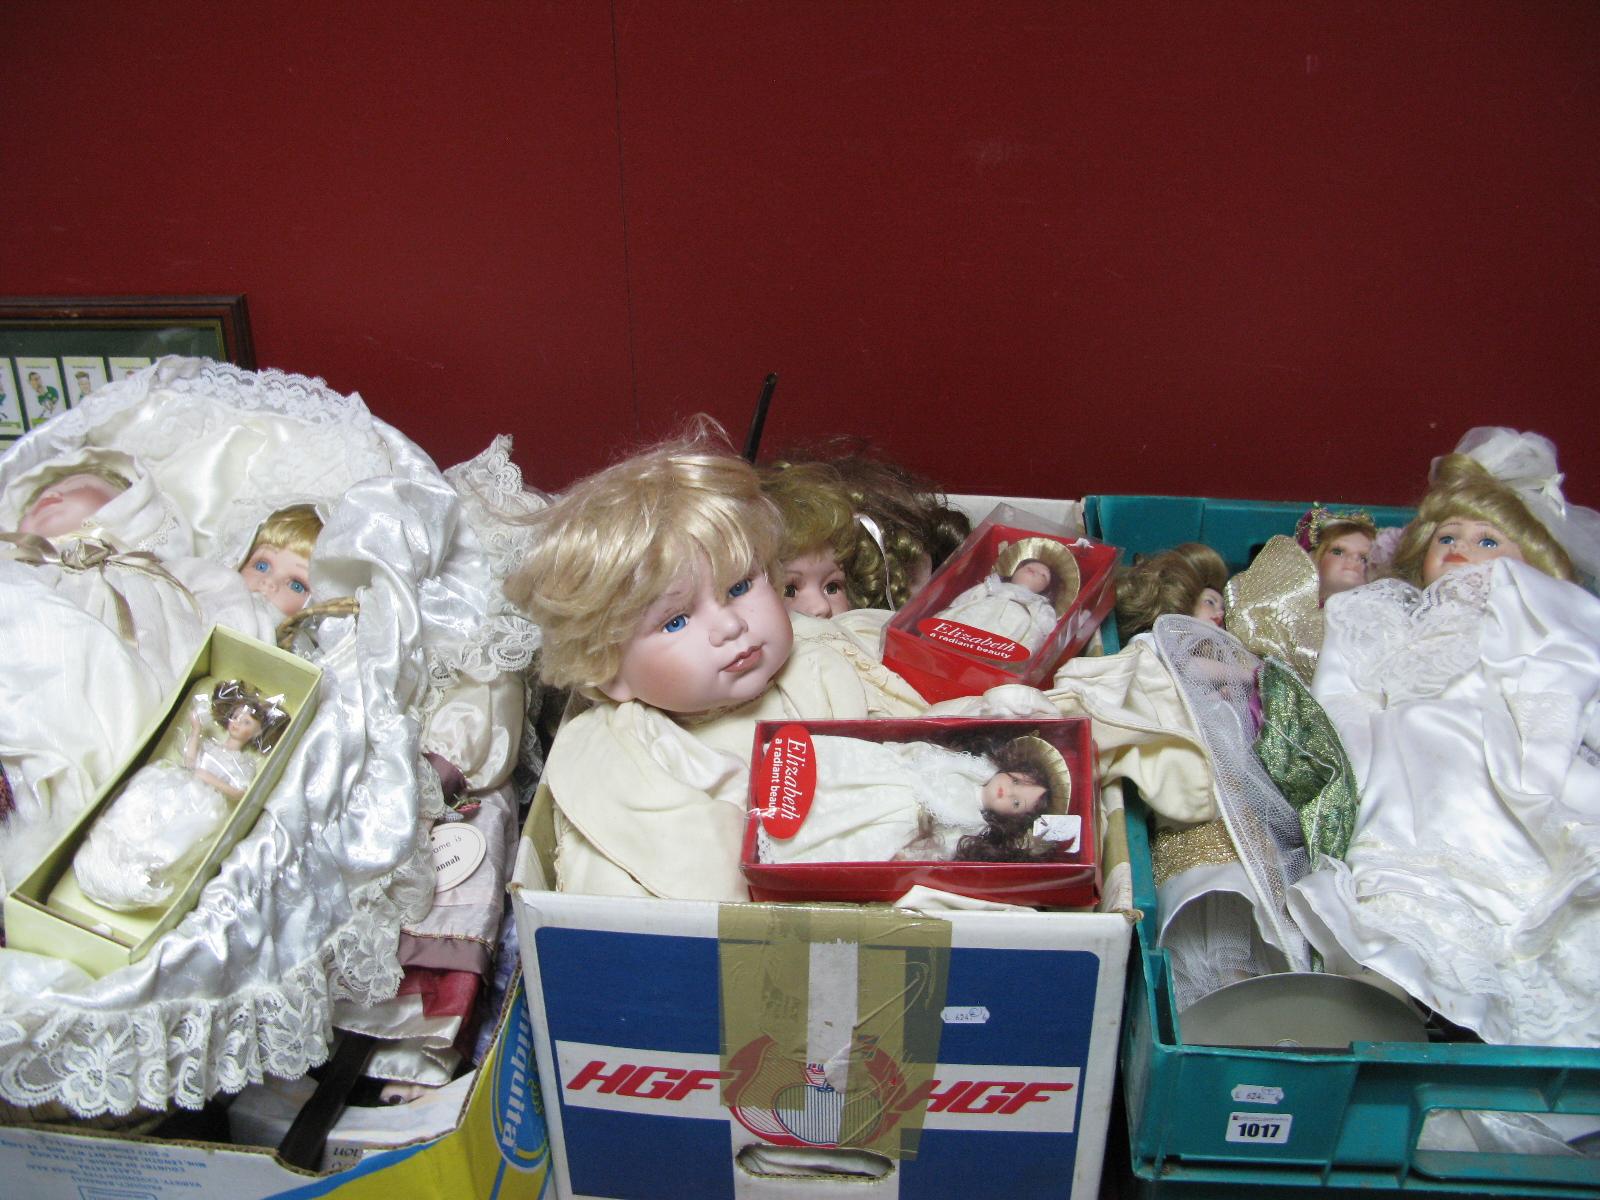 Lot 1017 - Quantity of Pottery Headed Dolls, Franklin Heirloom, Elizabeth.